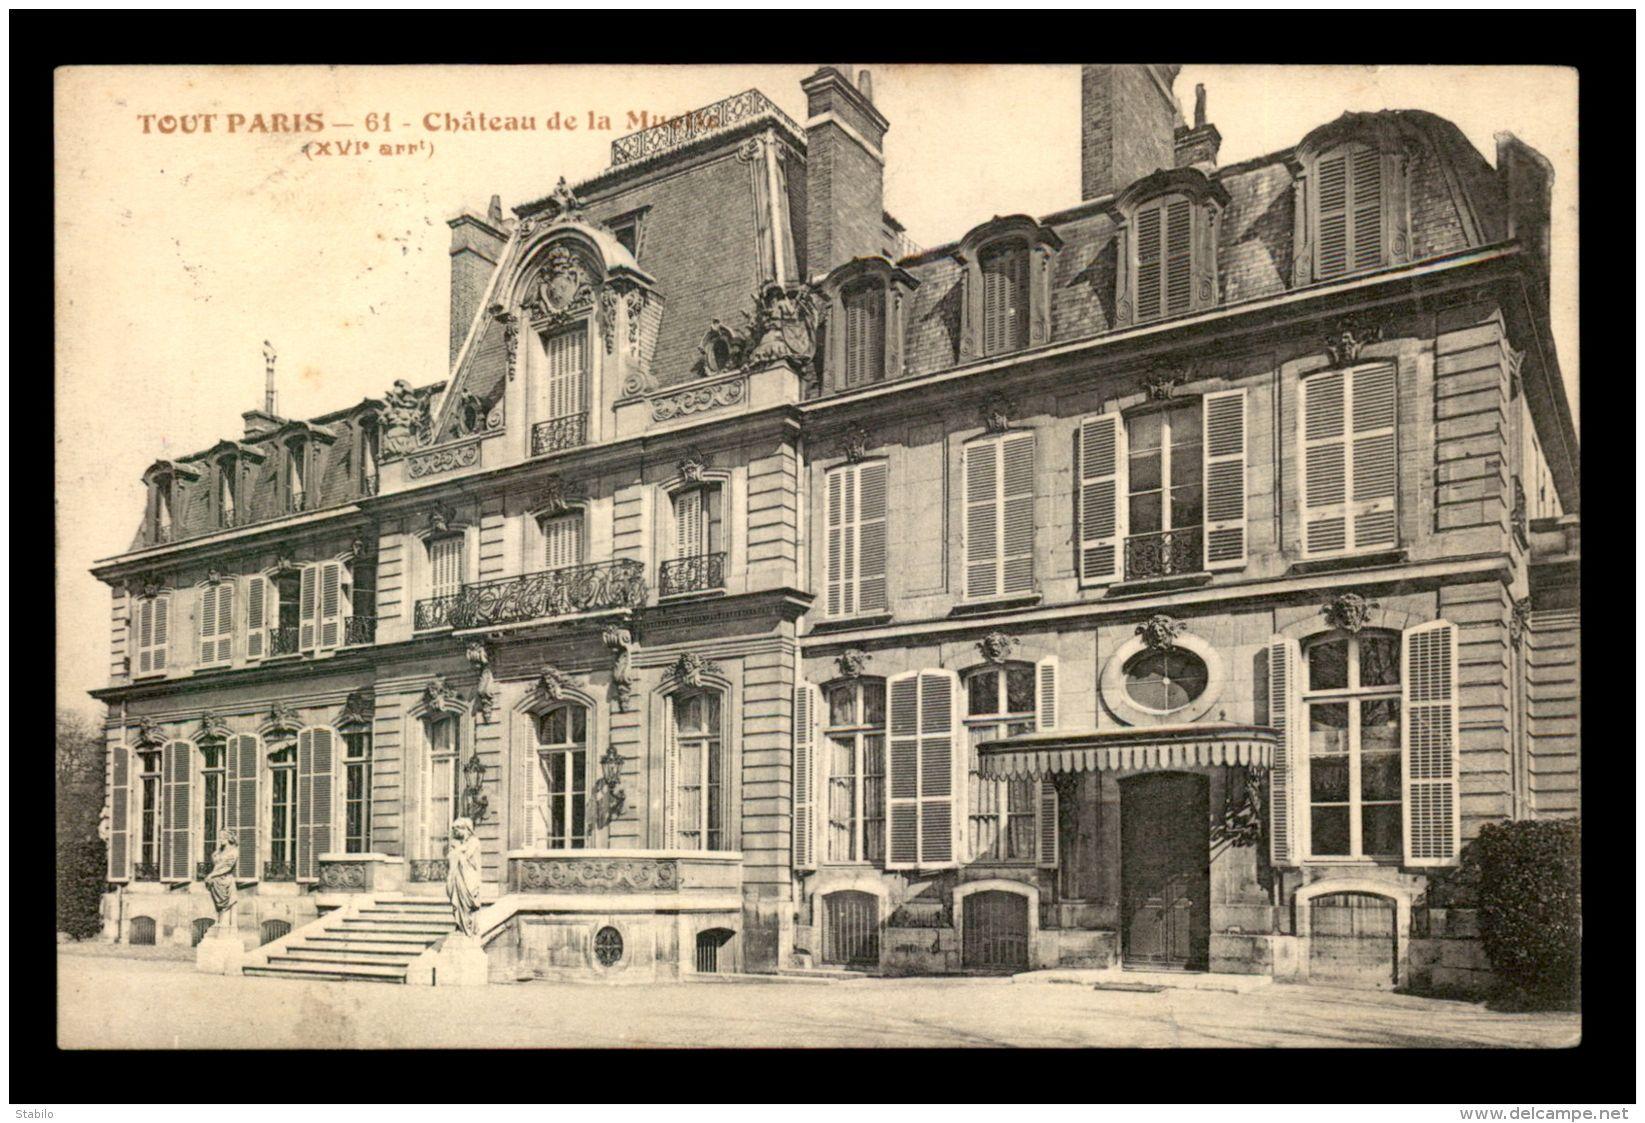 Muette chateau - Delcampe.net